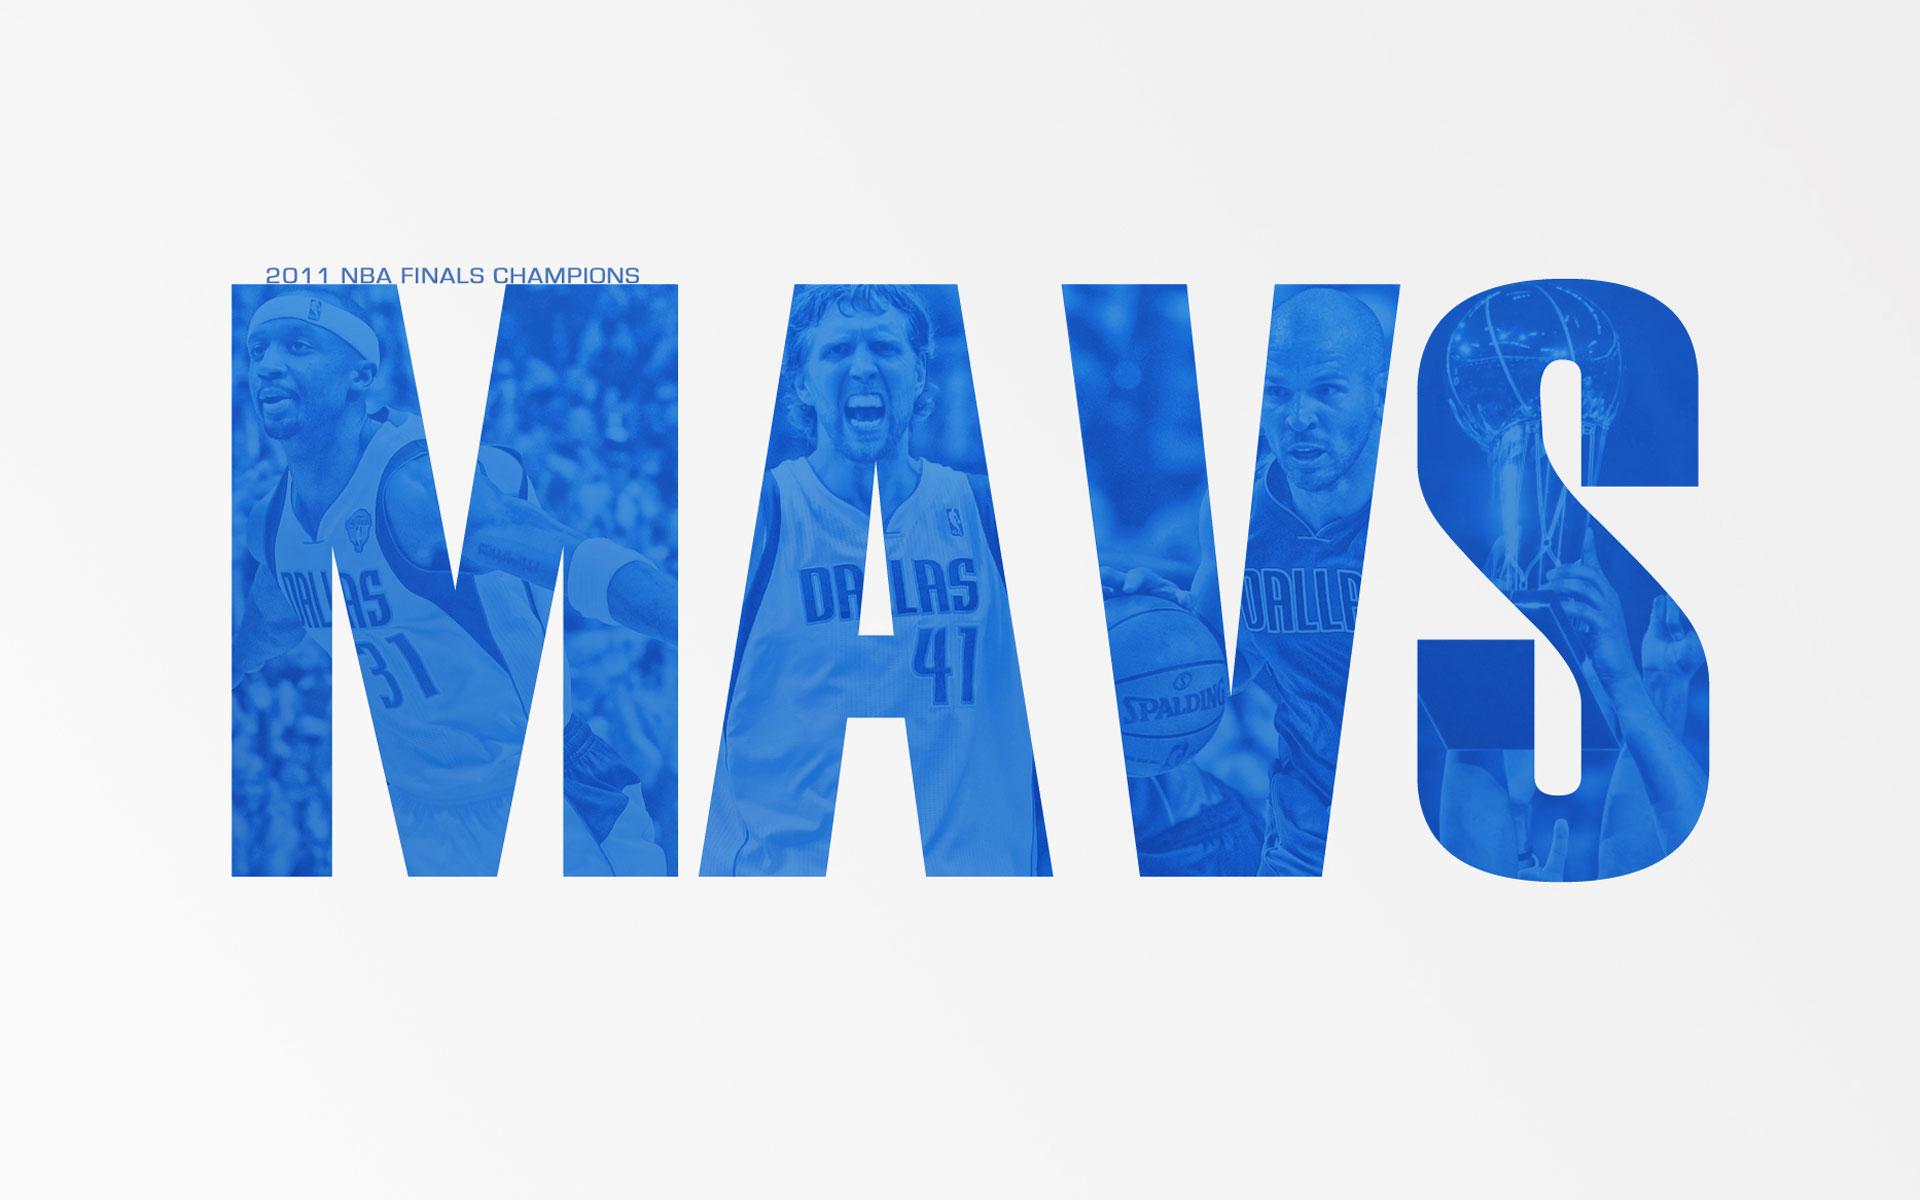 Dallas Mavericks Wallpapers Background - Wickedsa com